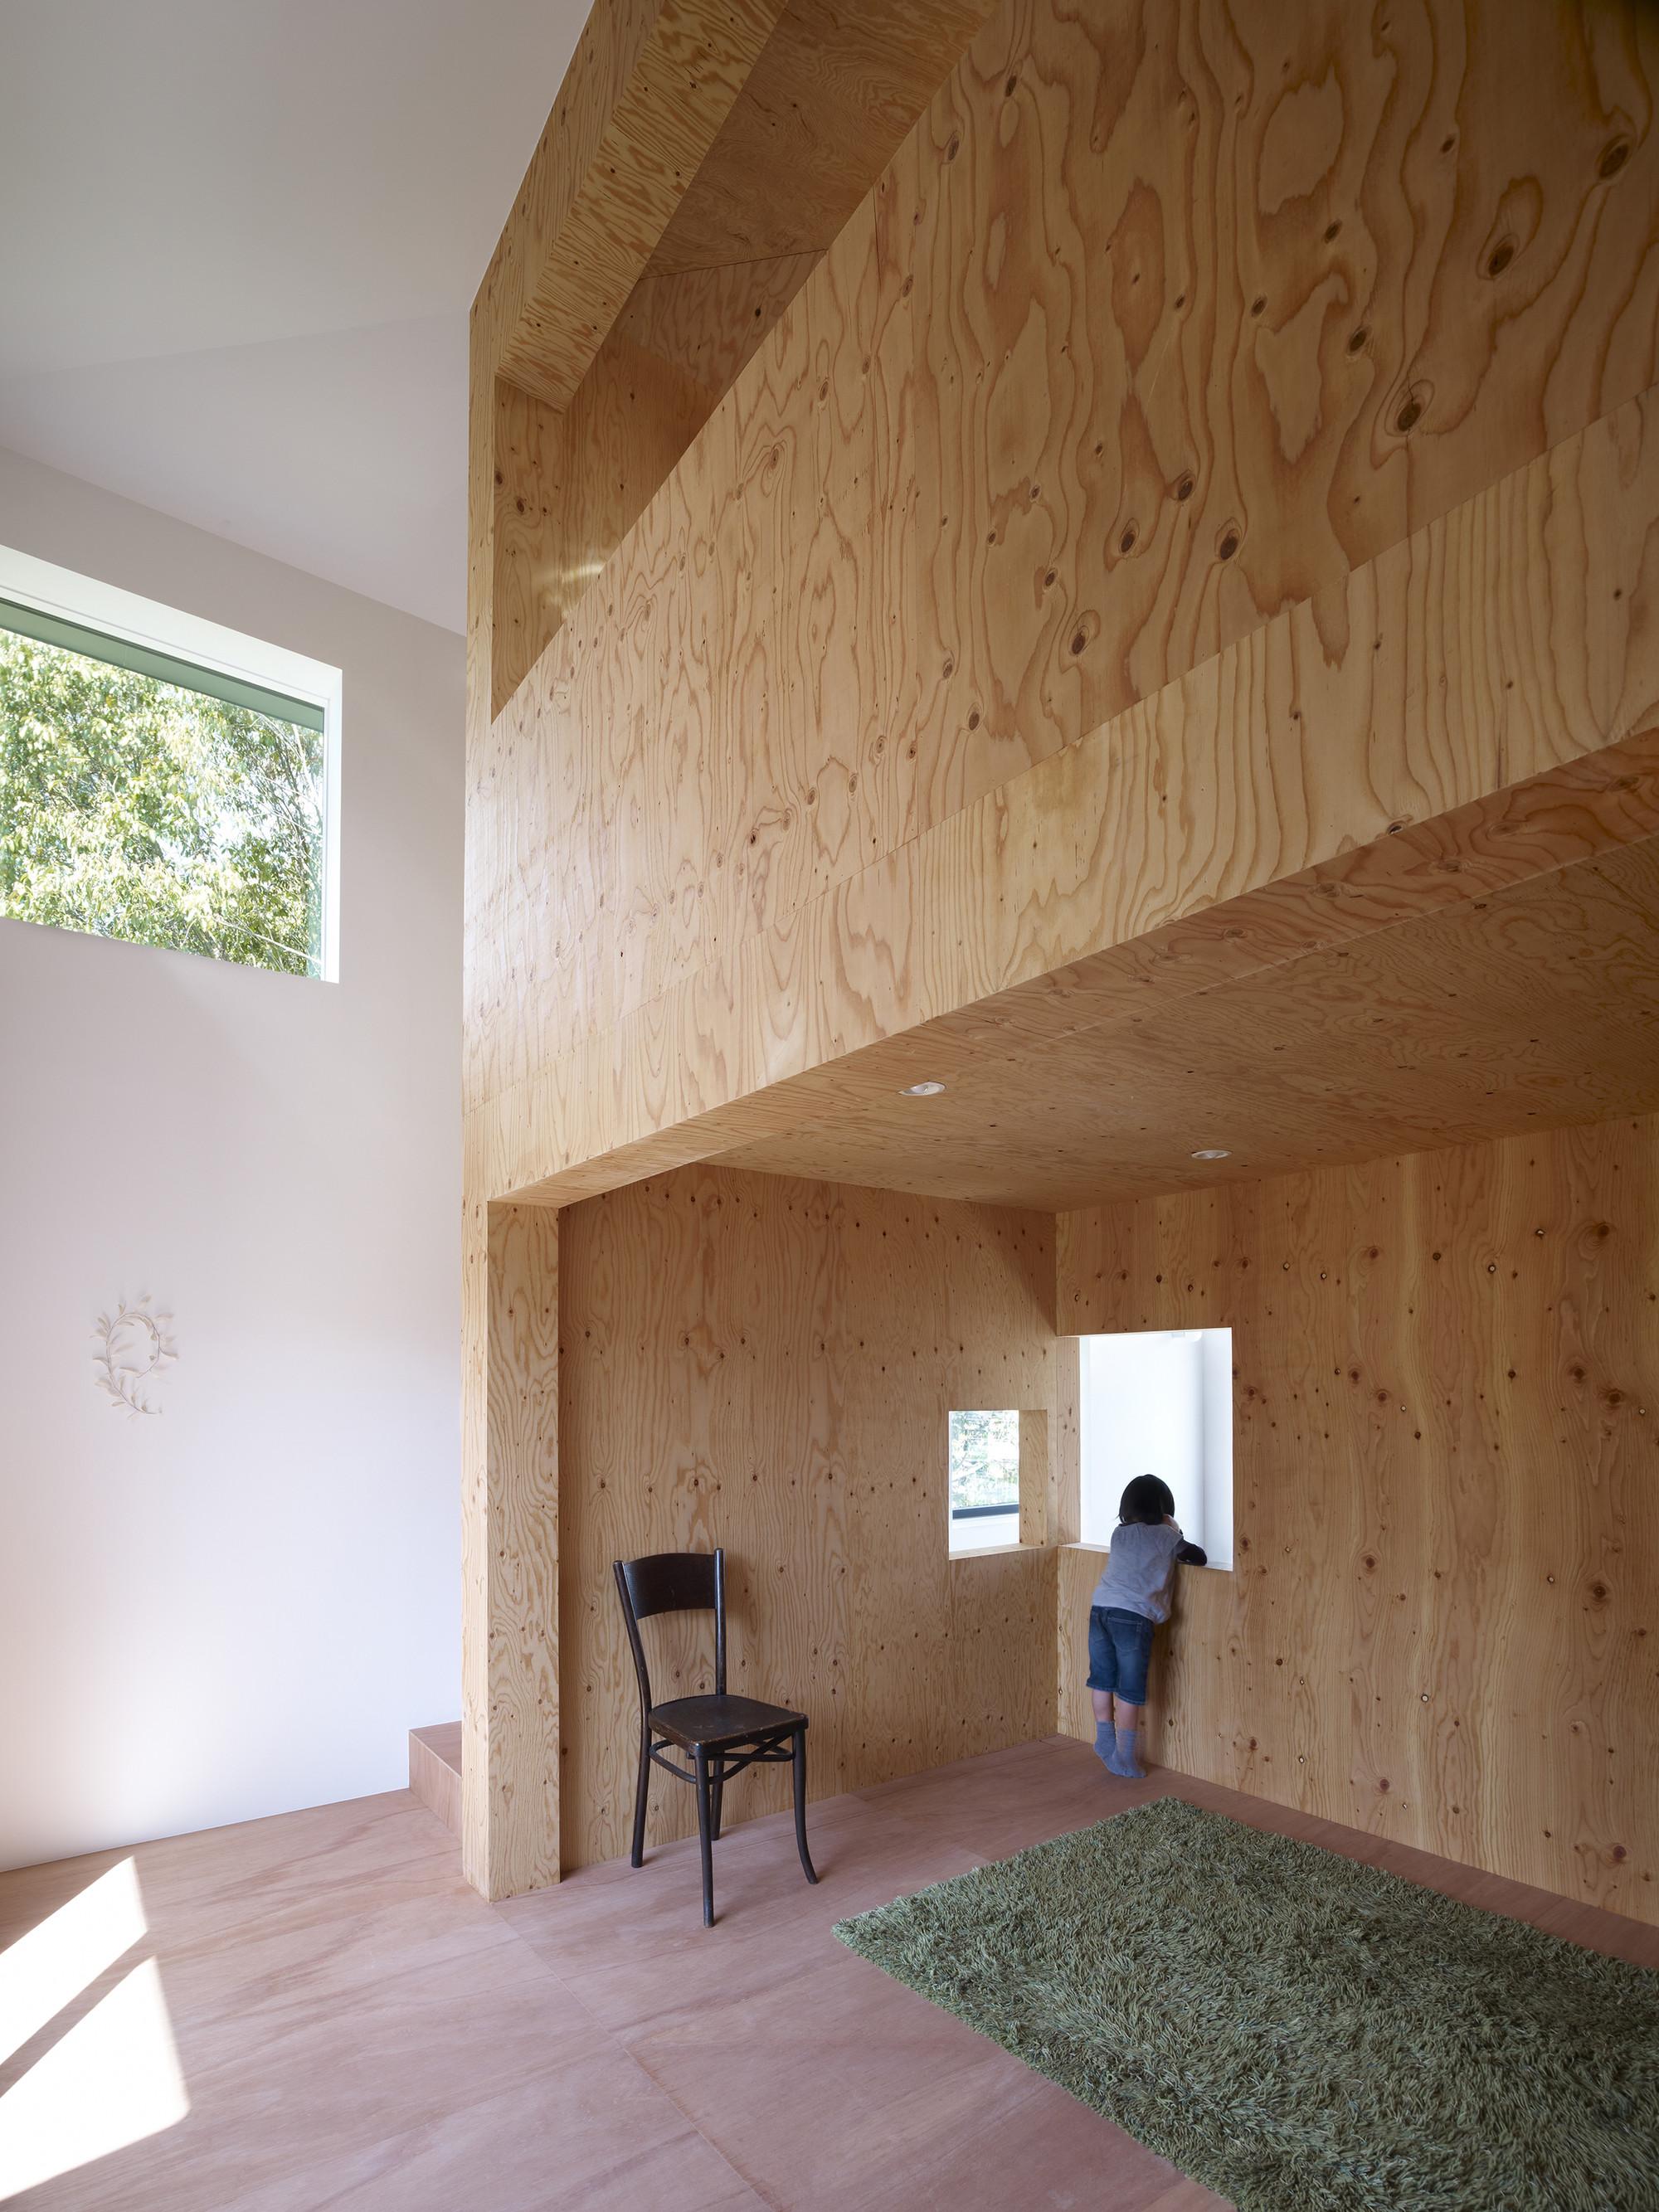 Belly House / Tomohiro Hata Architect and Associates